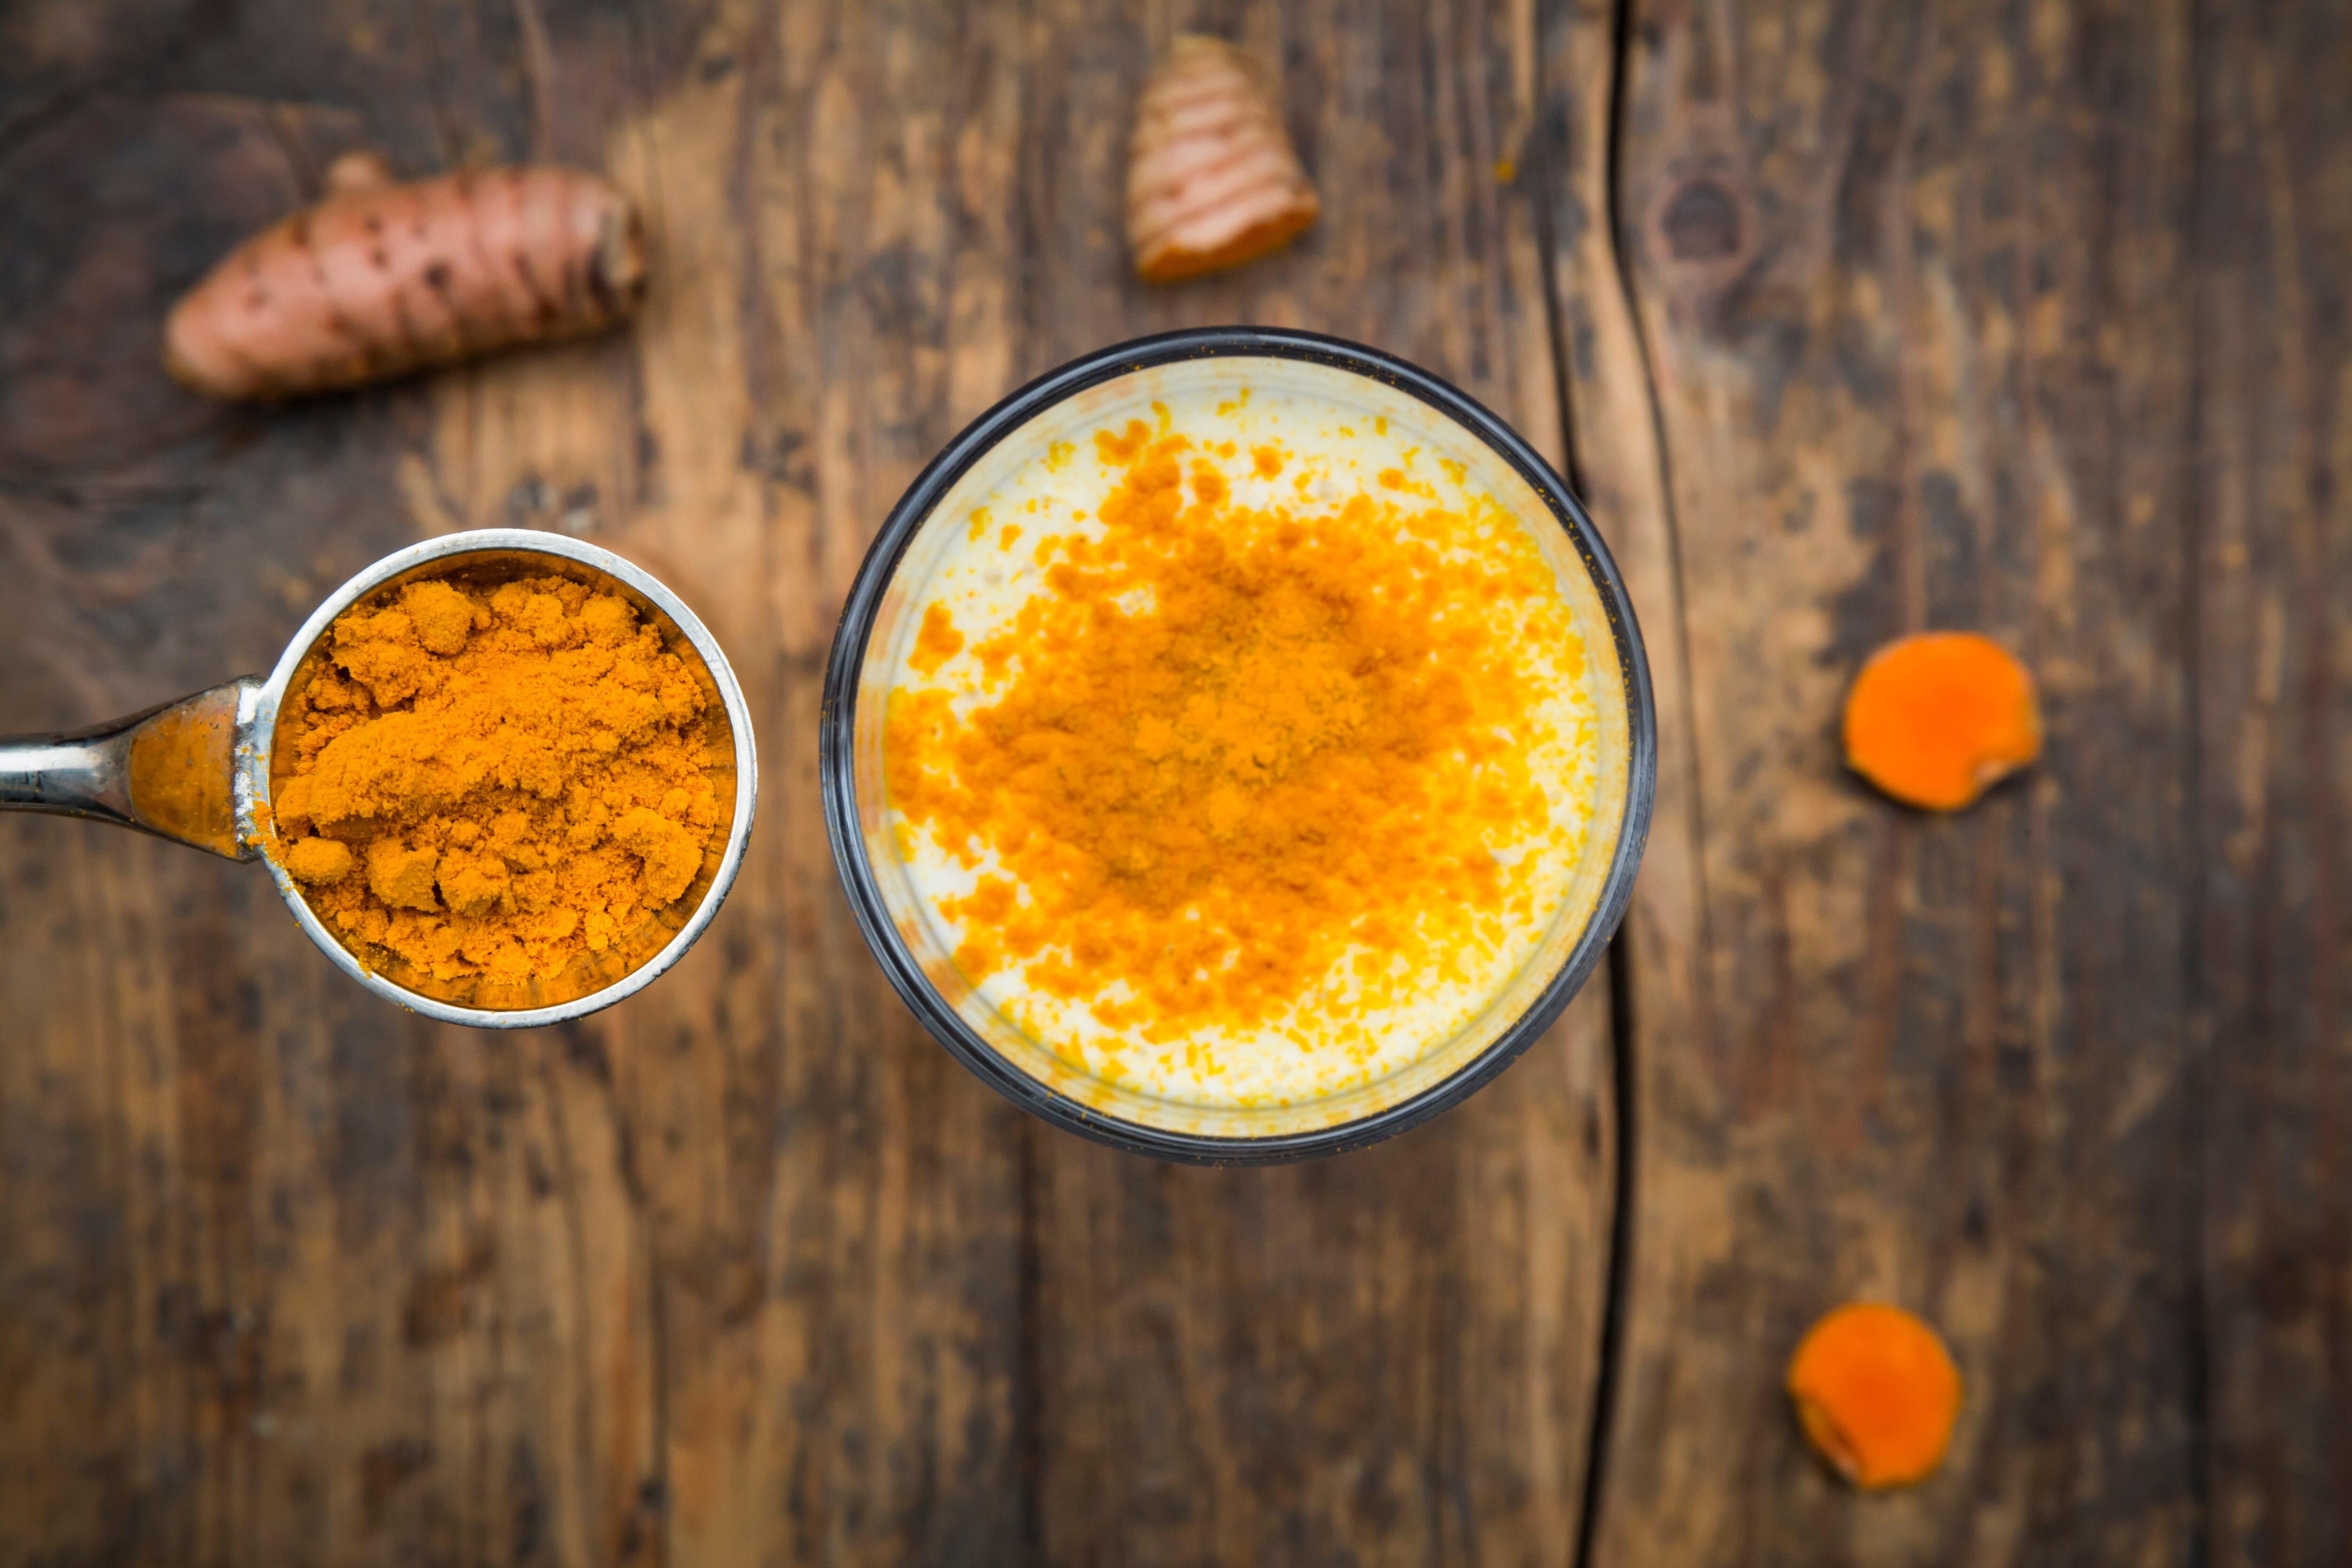 3 gesunde Latte-Macchiato-Alternativen zum Selbermachen | FITBOOK